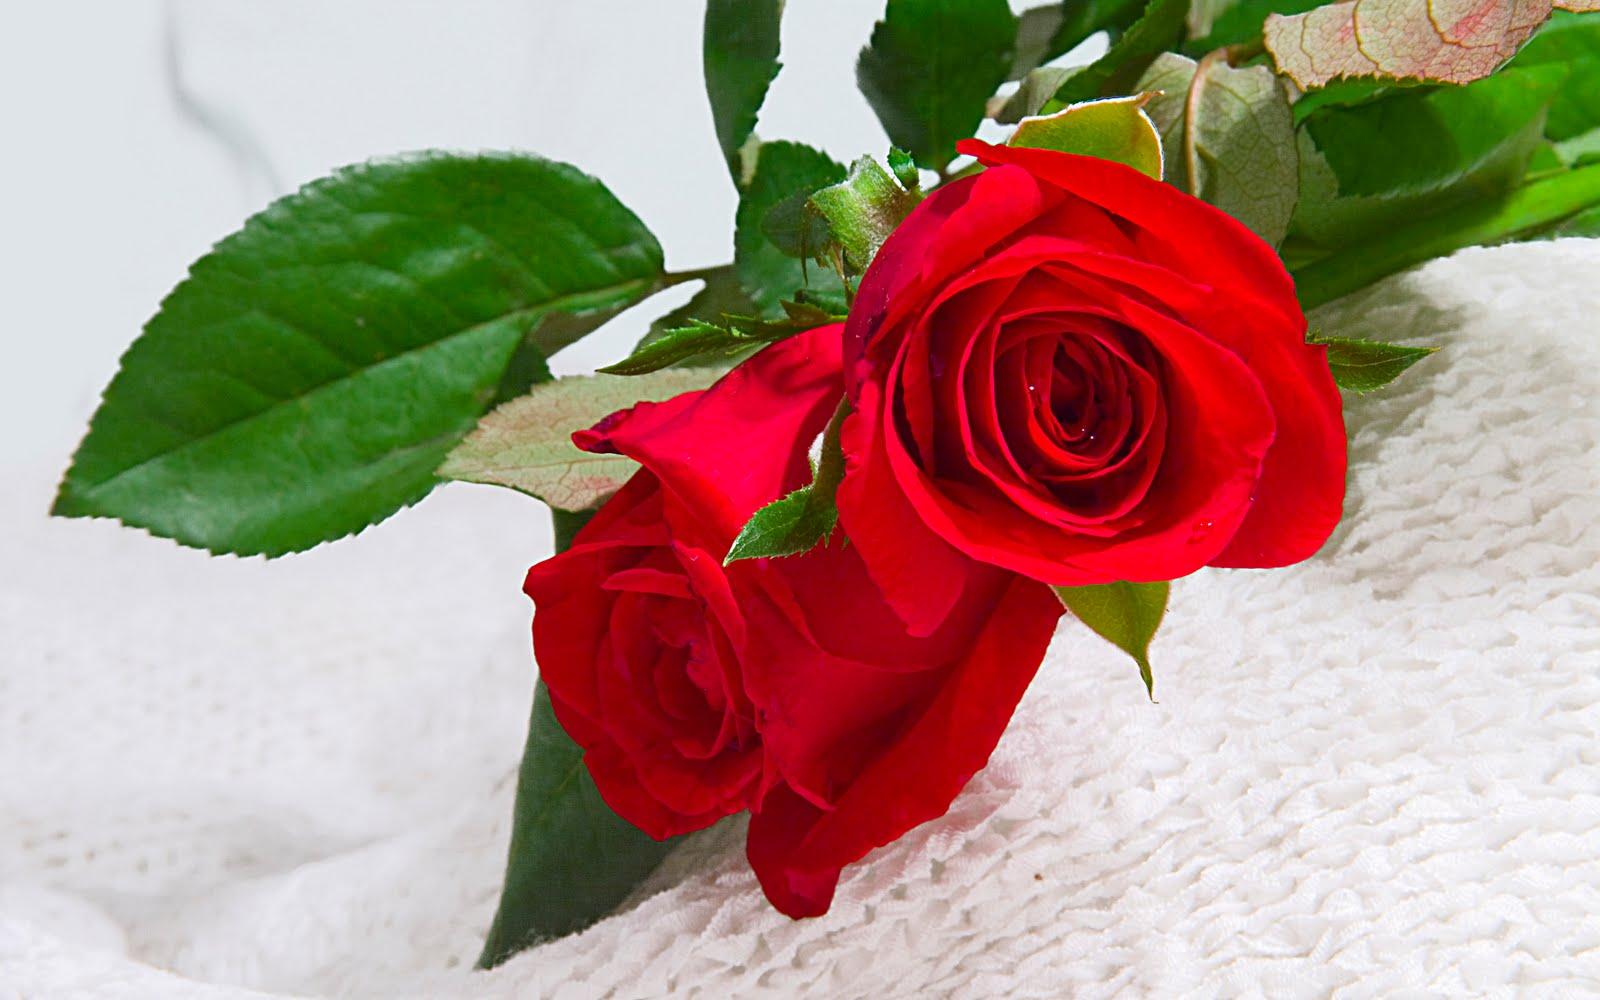 http://1.bp.blogspot.com/-MHR_BC8ZQ4k/TlPcvLlFsGI/AAAAAAAAHEQ/rEcrbPTxQVo/s1600/Latest+red+Flower+Wallpaper1.jpg